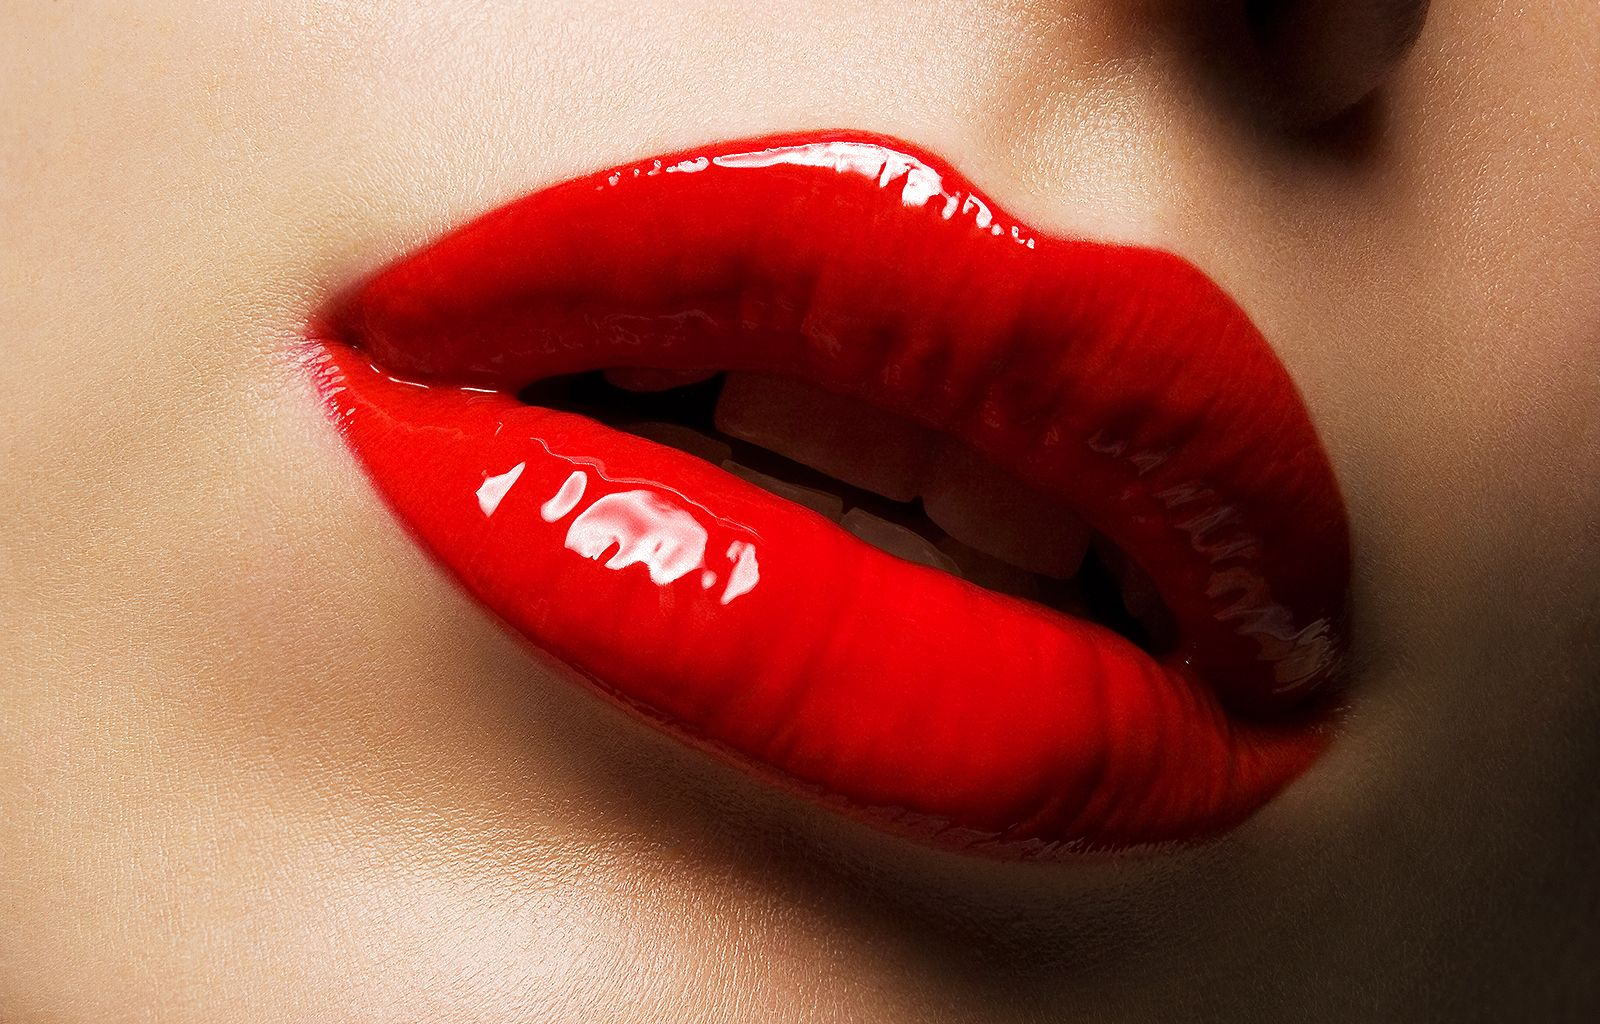 9 Lip Secrets Revealed